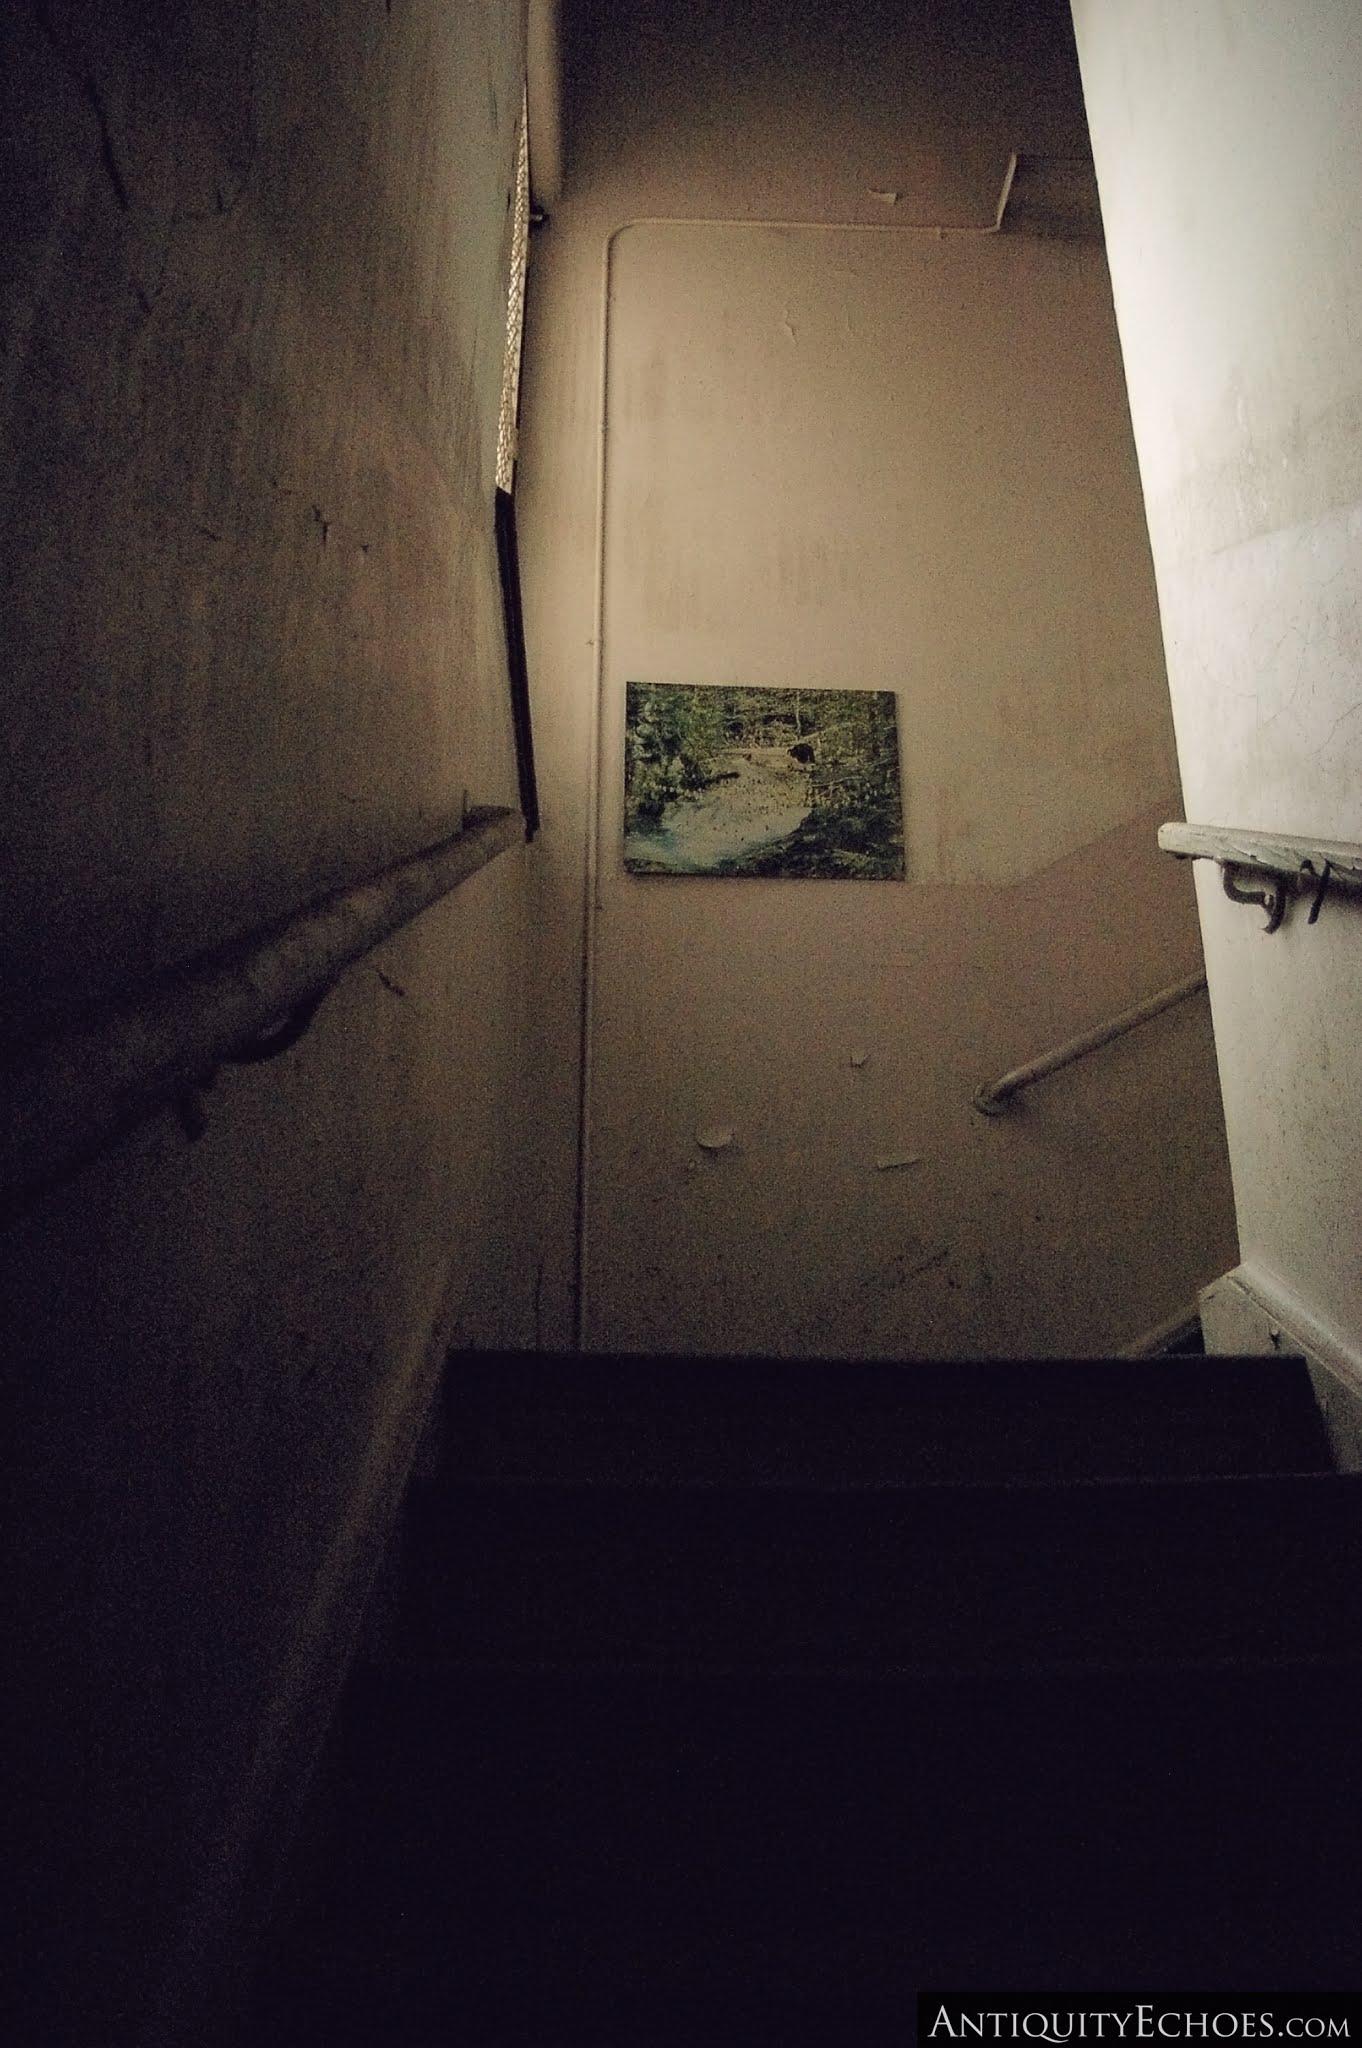 Overbrook Asylum - Stairs from Basement